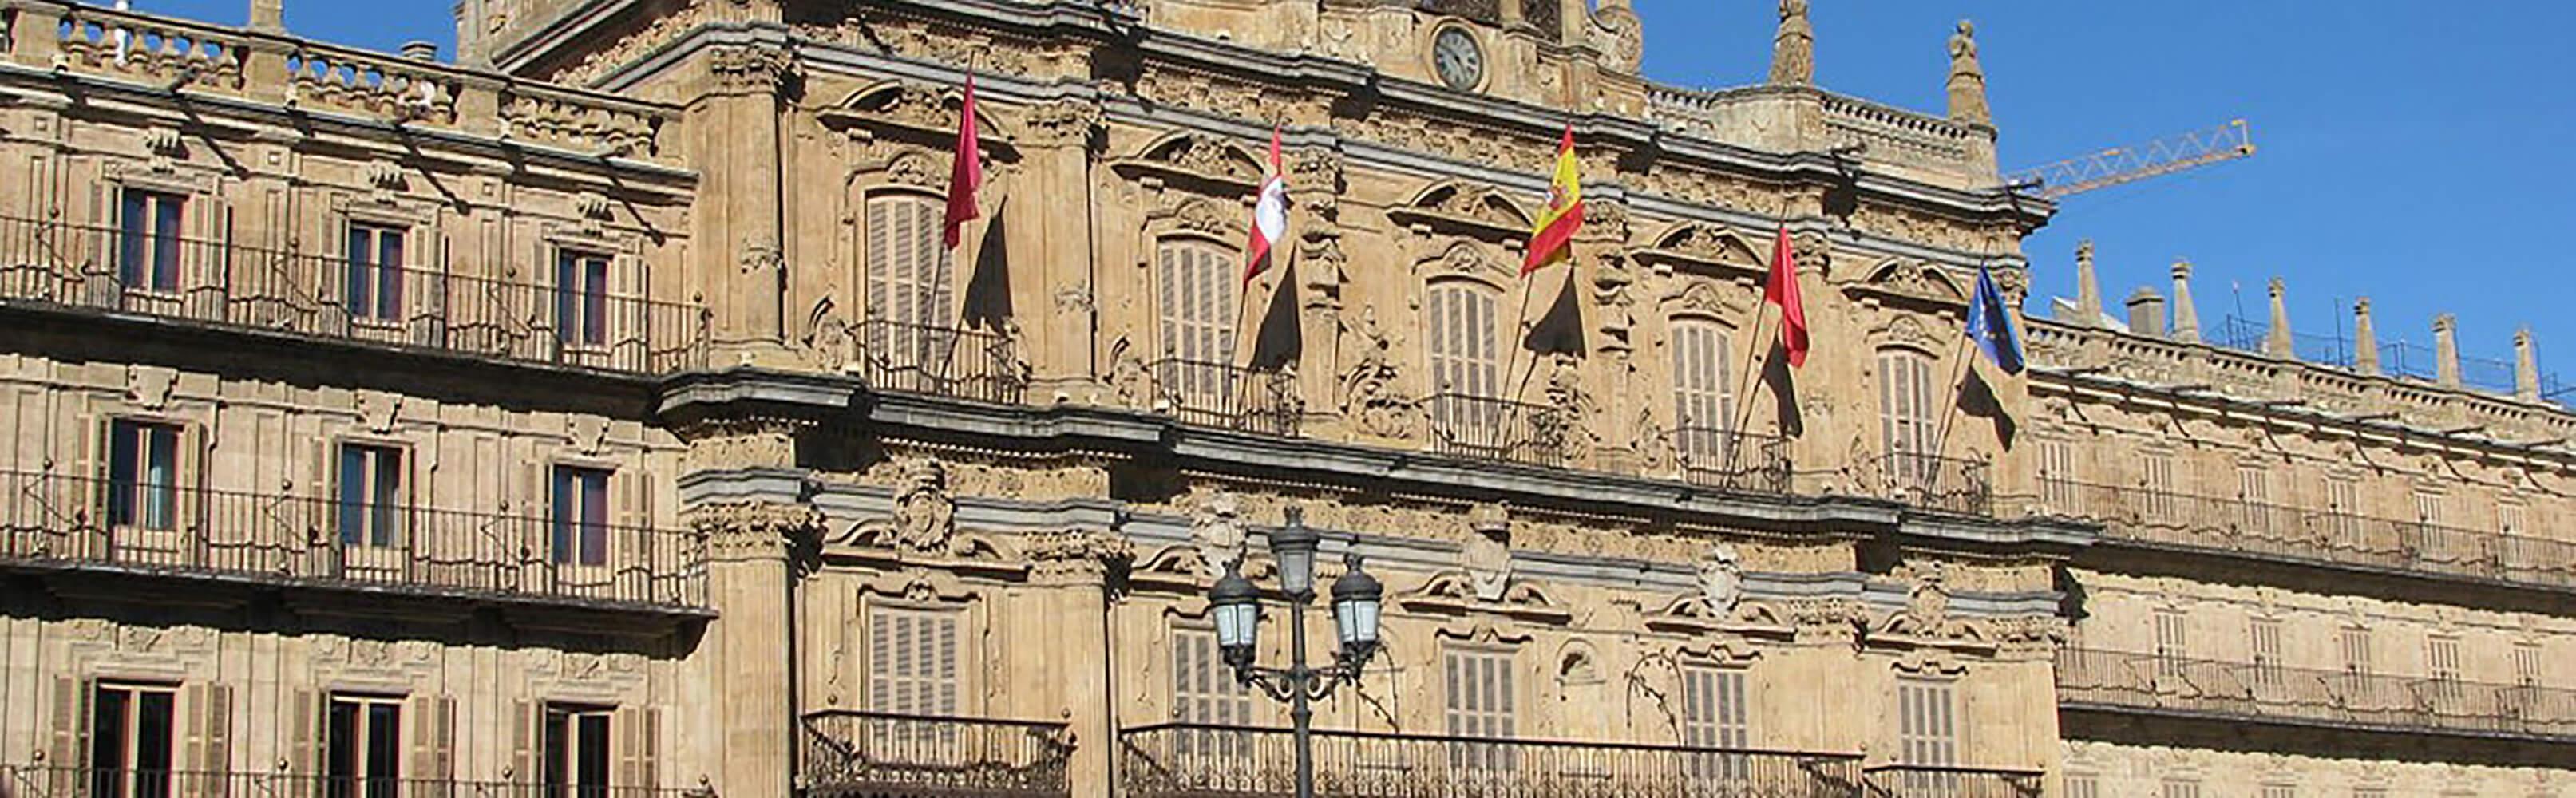 Plaza Mayor de Salamanca 1